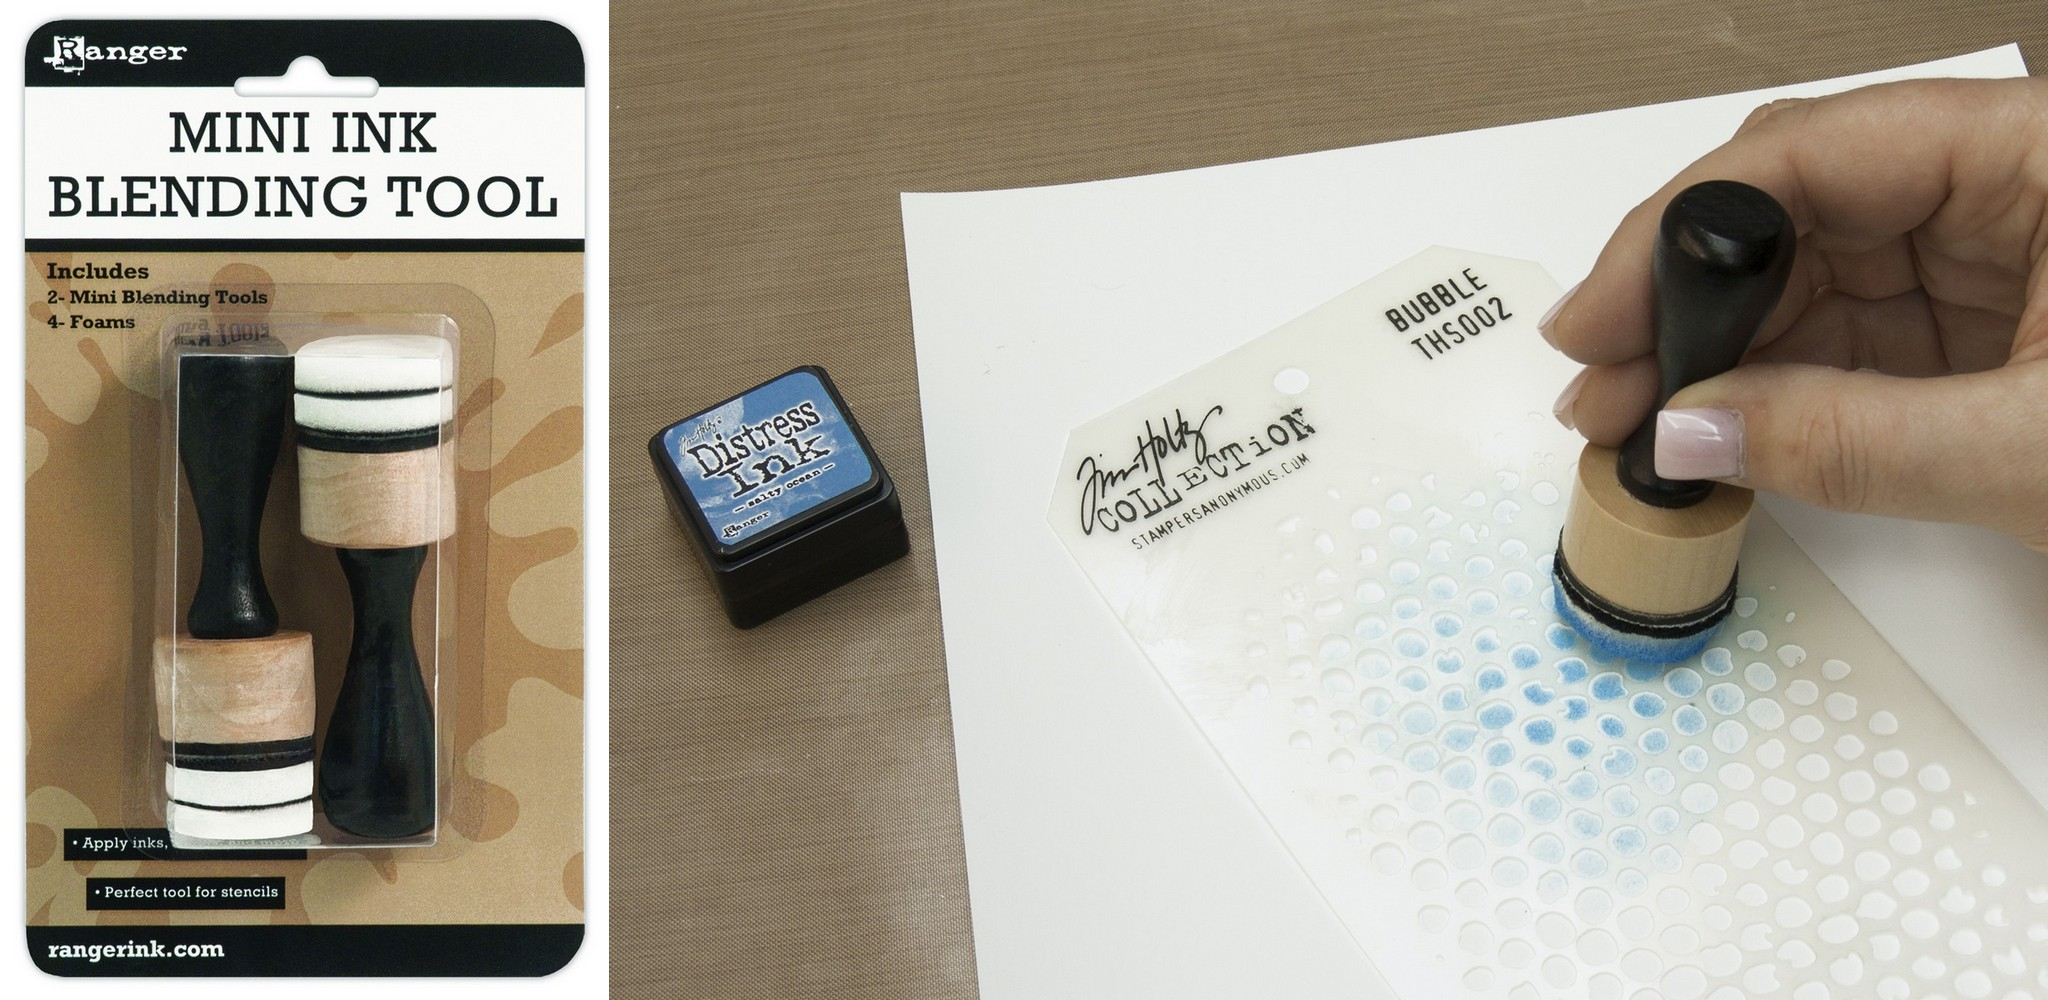 Inkssentials Mini Ink Blending Tool 1 Round